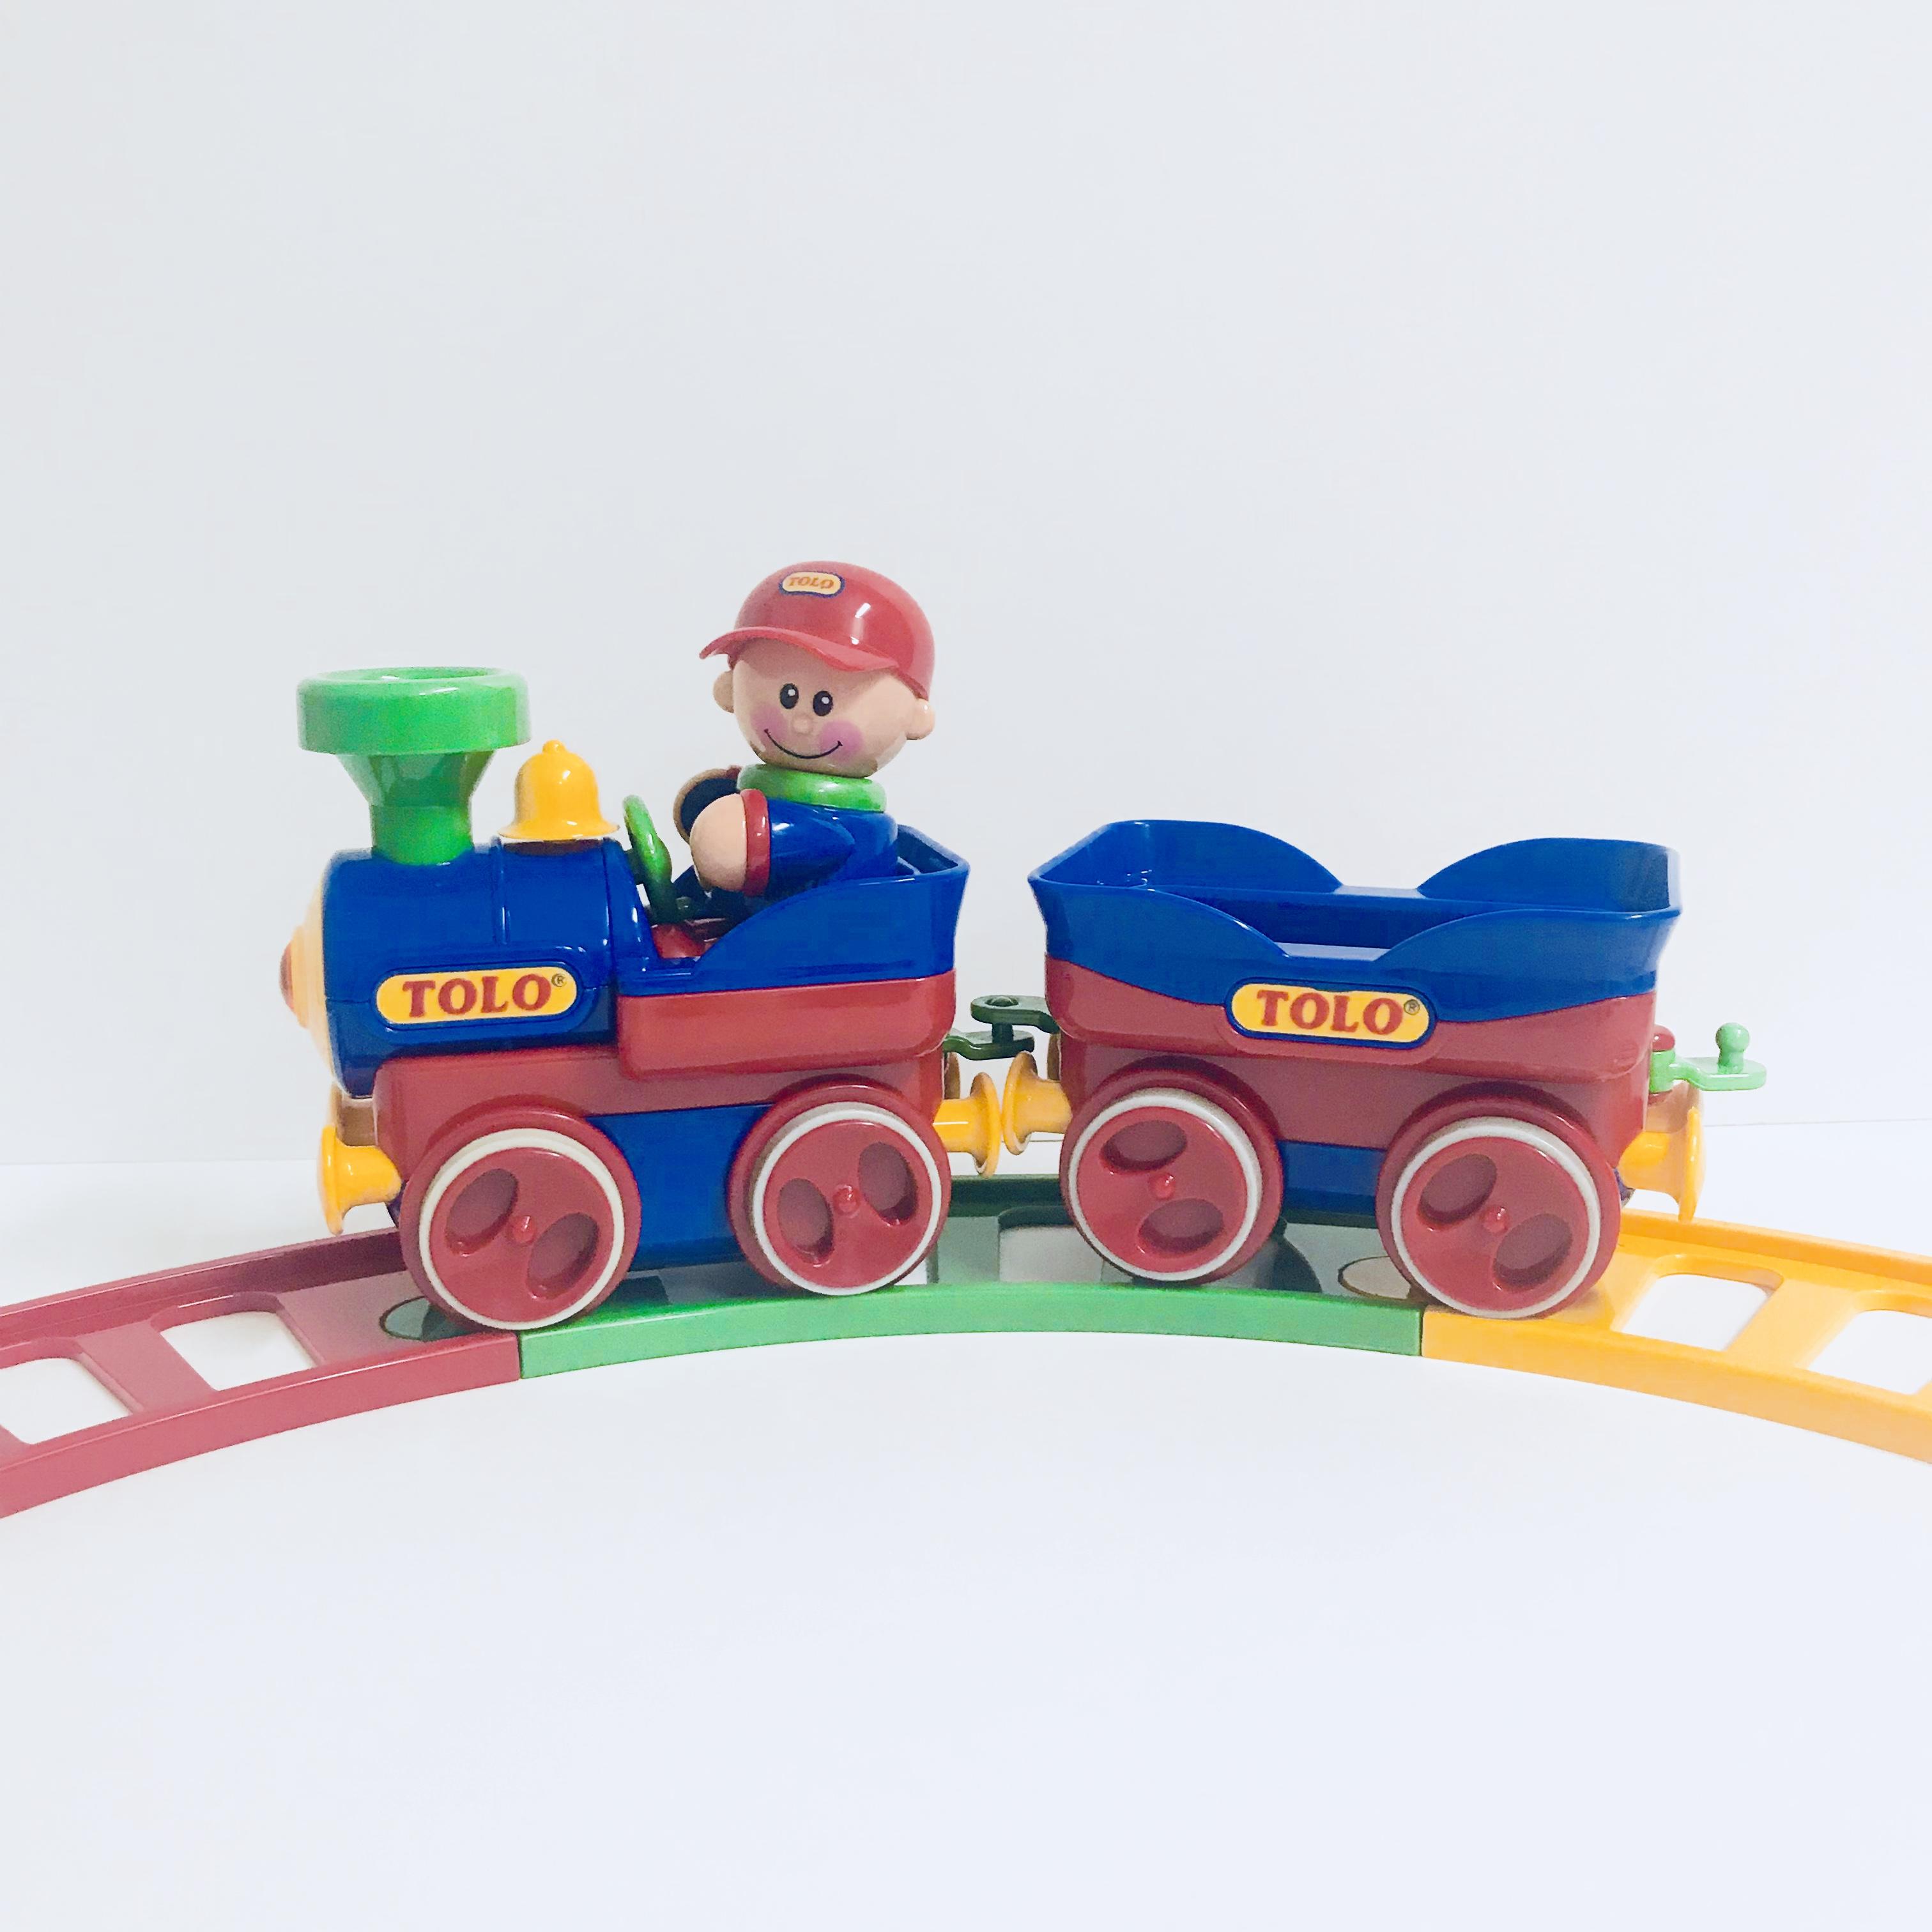 Tolo Train with Tracks